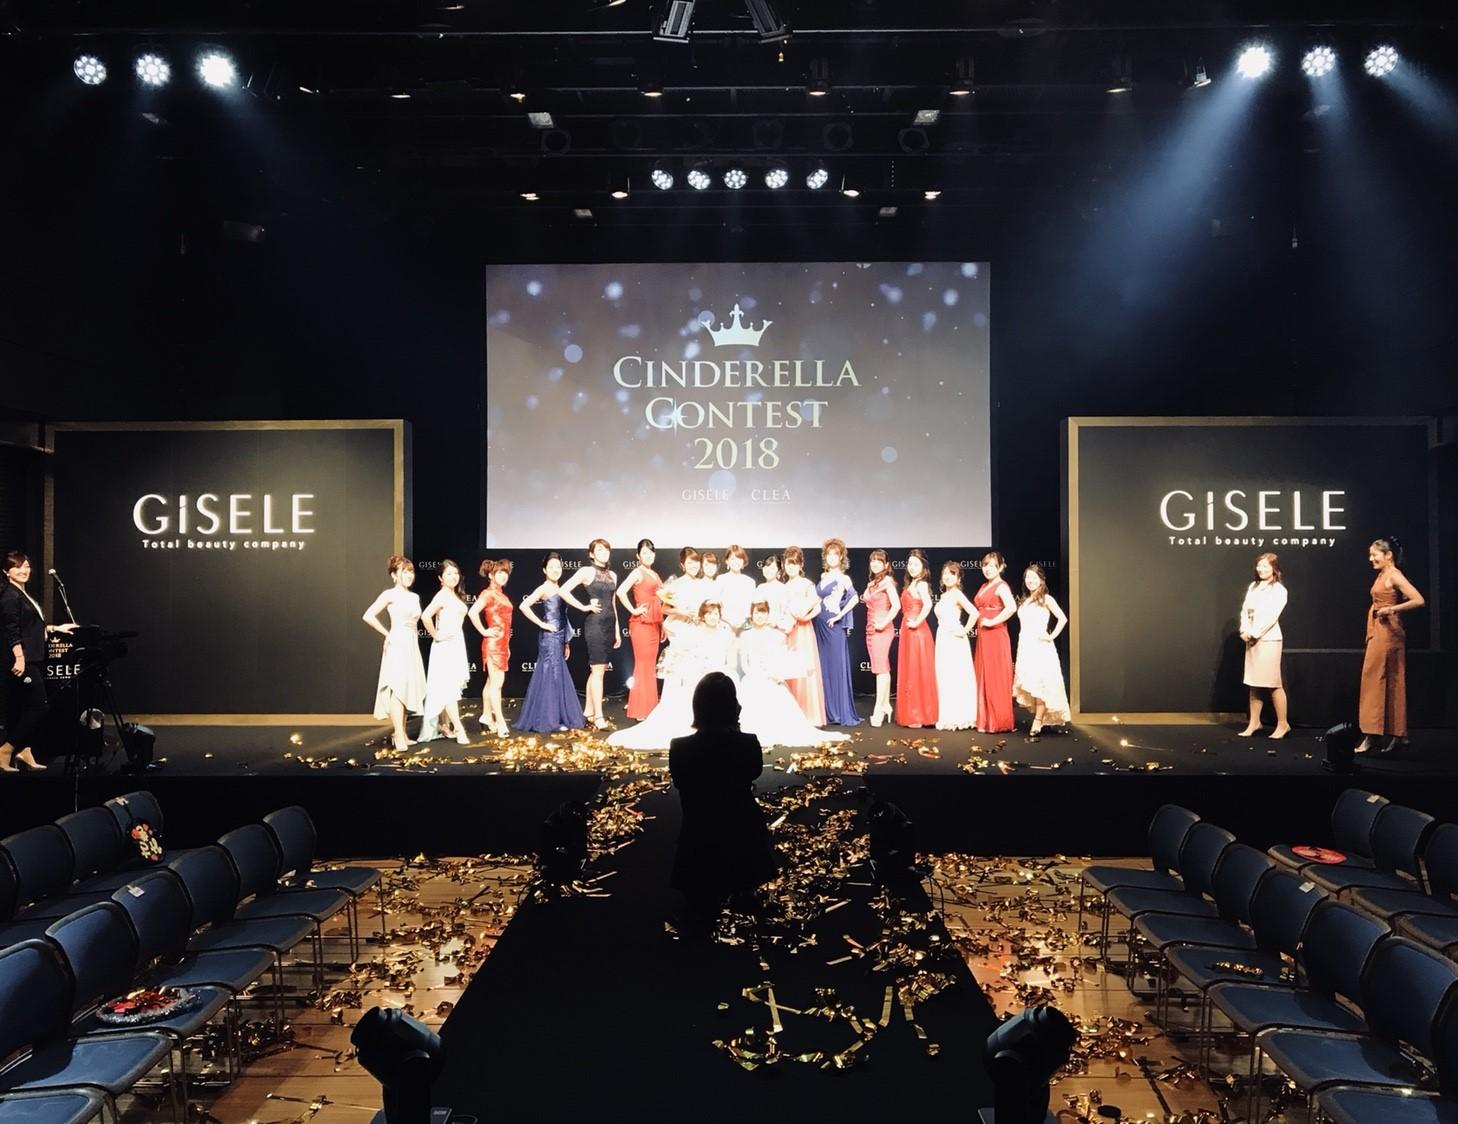 GISELE Cinderella Contest 2018